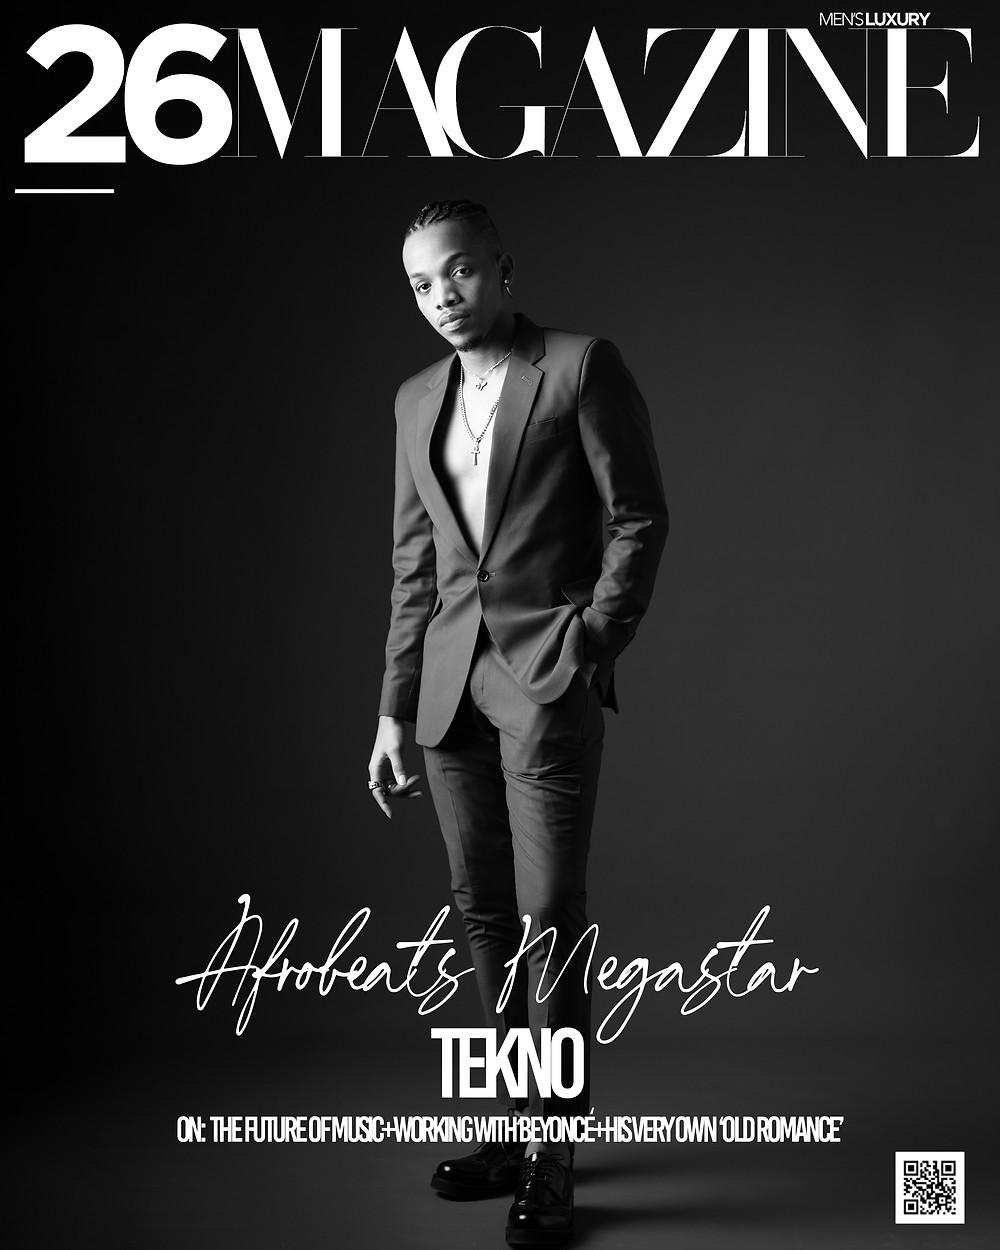 Afrobeats Megastar Tekno Covers 26 Magazine. 26 Men's Luxury Magazine